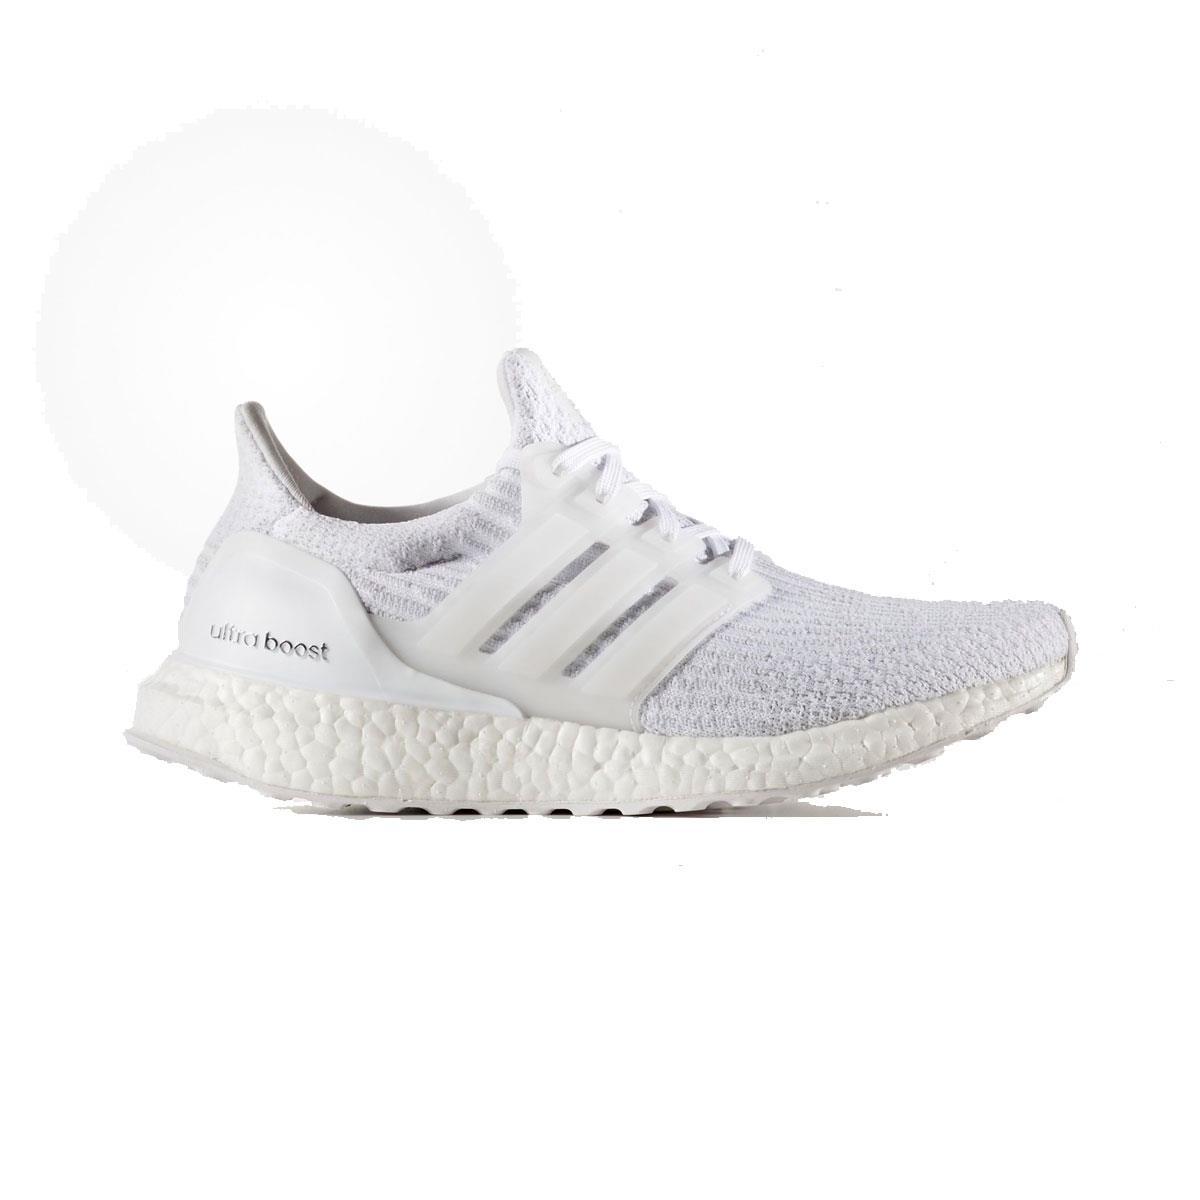 00638bfae3a81 Tênis Adidas Ultra Boost 2017 Feminino